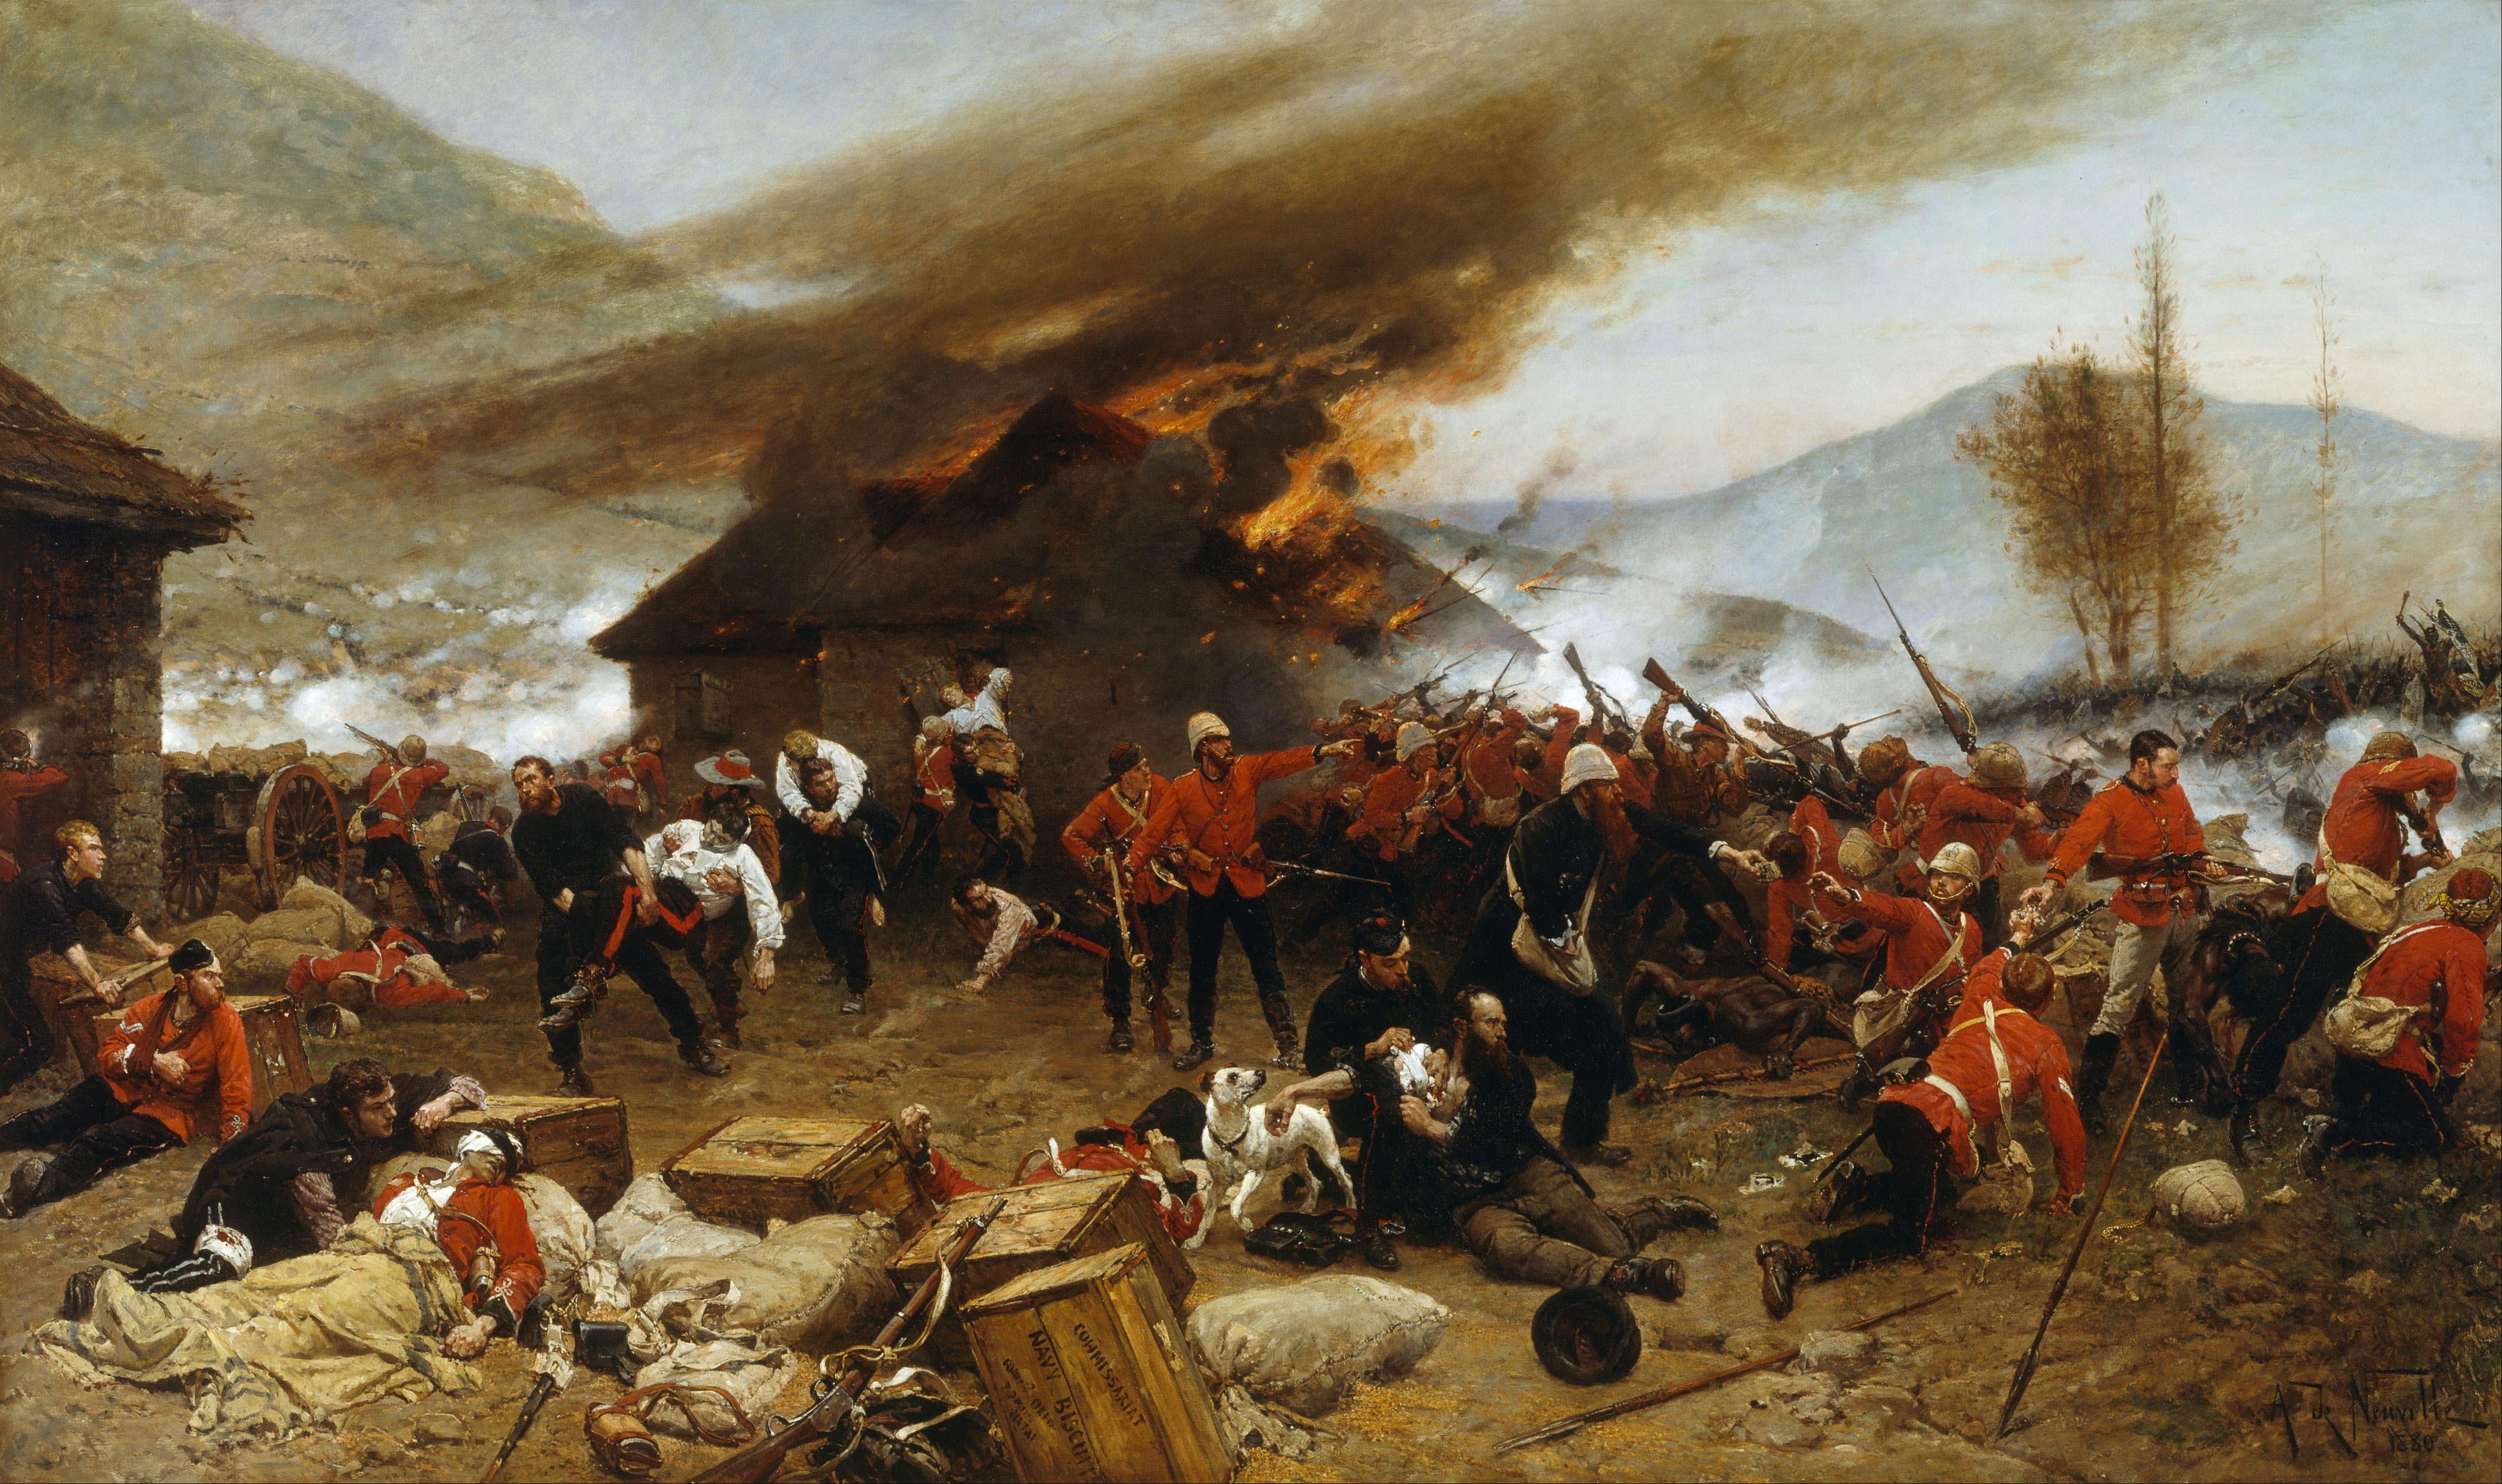 Alphonse_de_Neuville_-_The_defence_of_Rorke's_Drift_1879